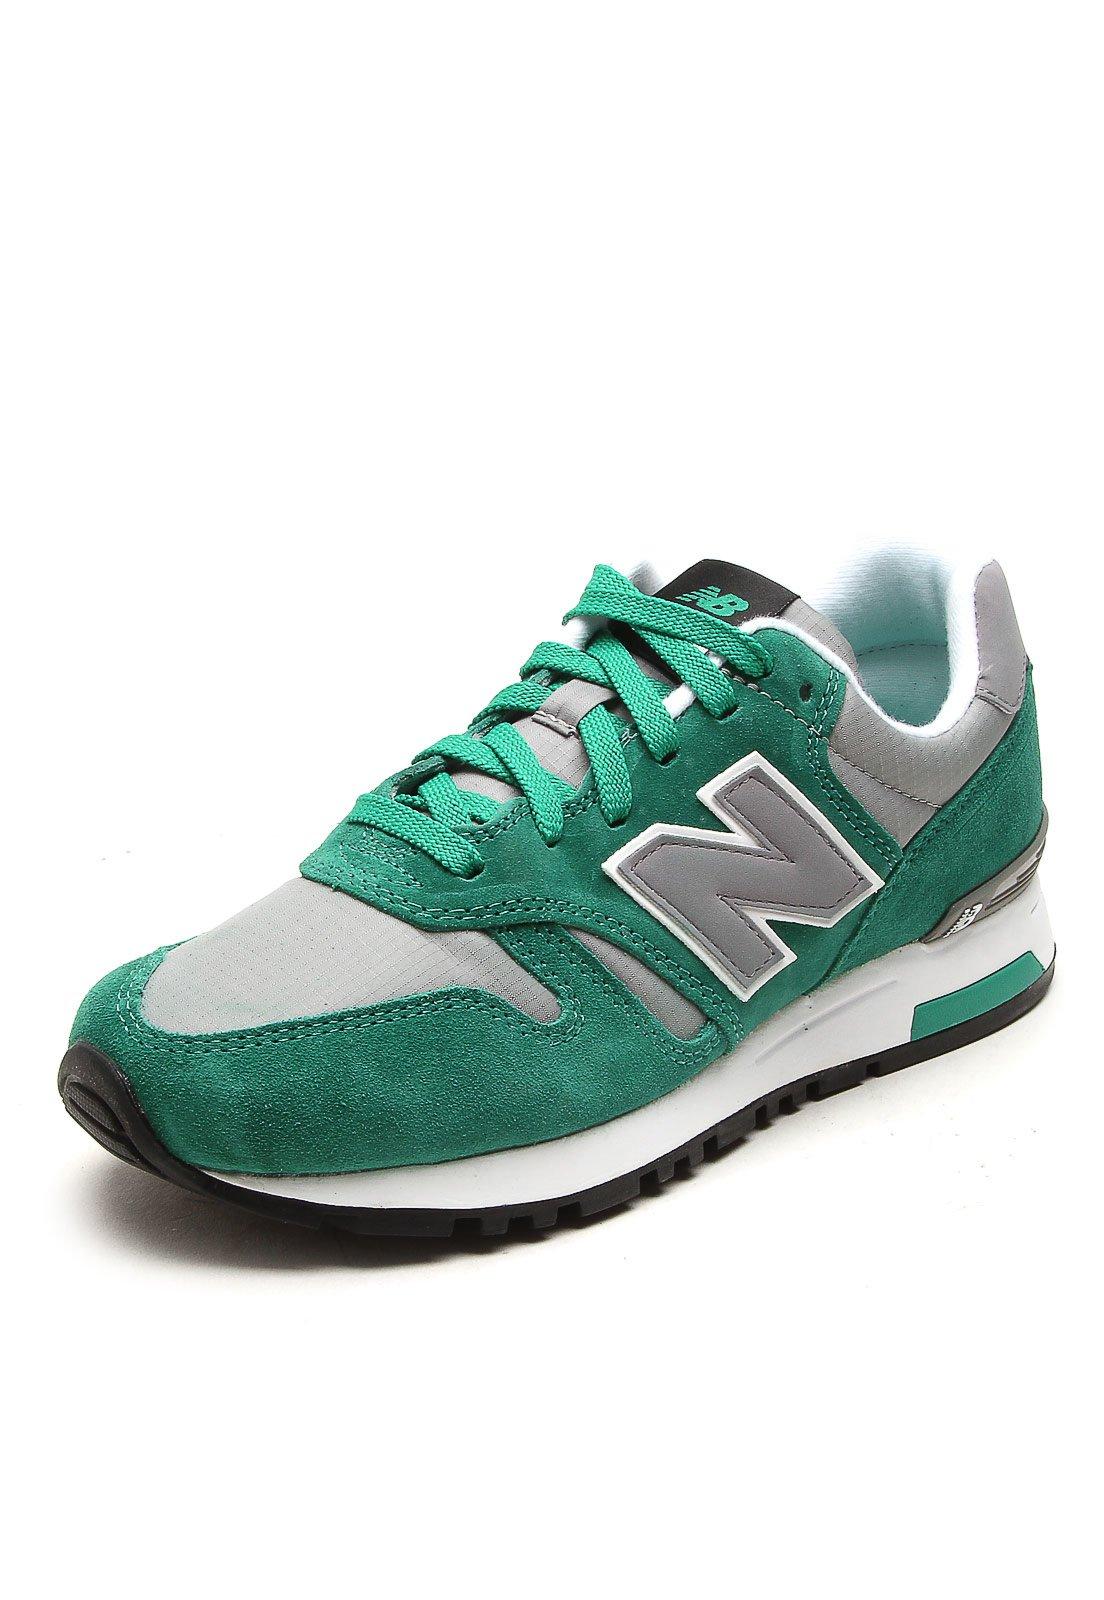 new balance verde e cinza